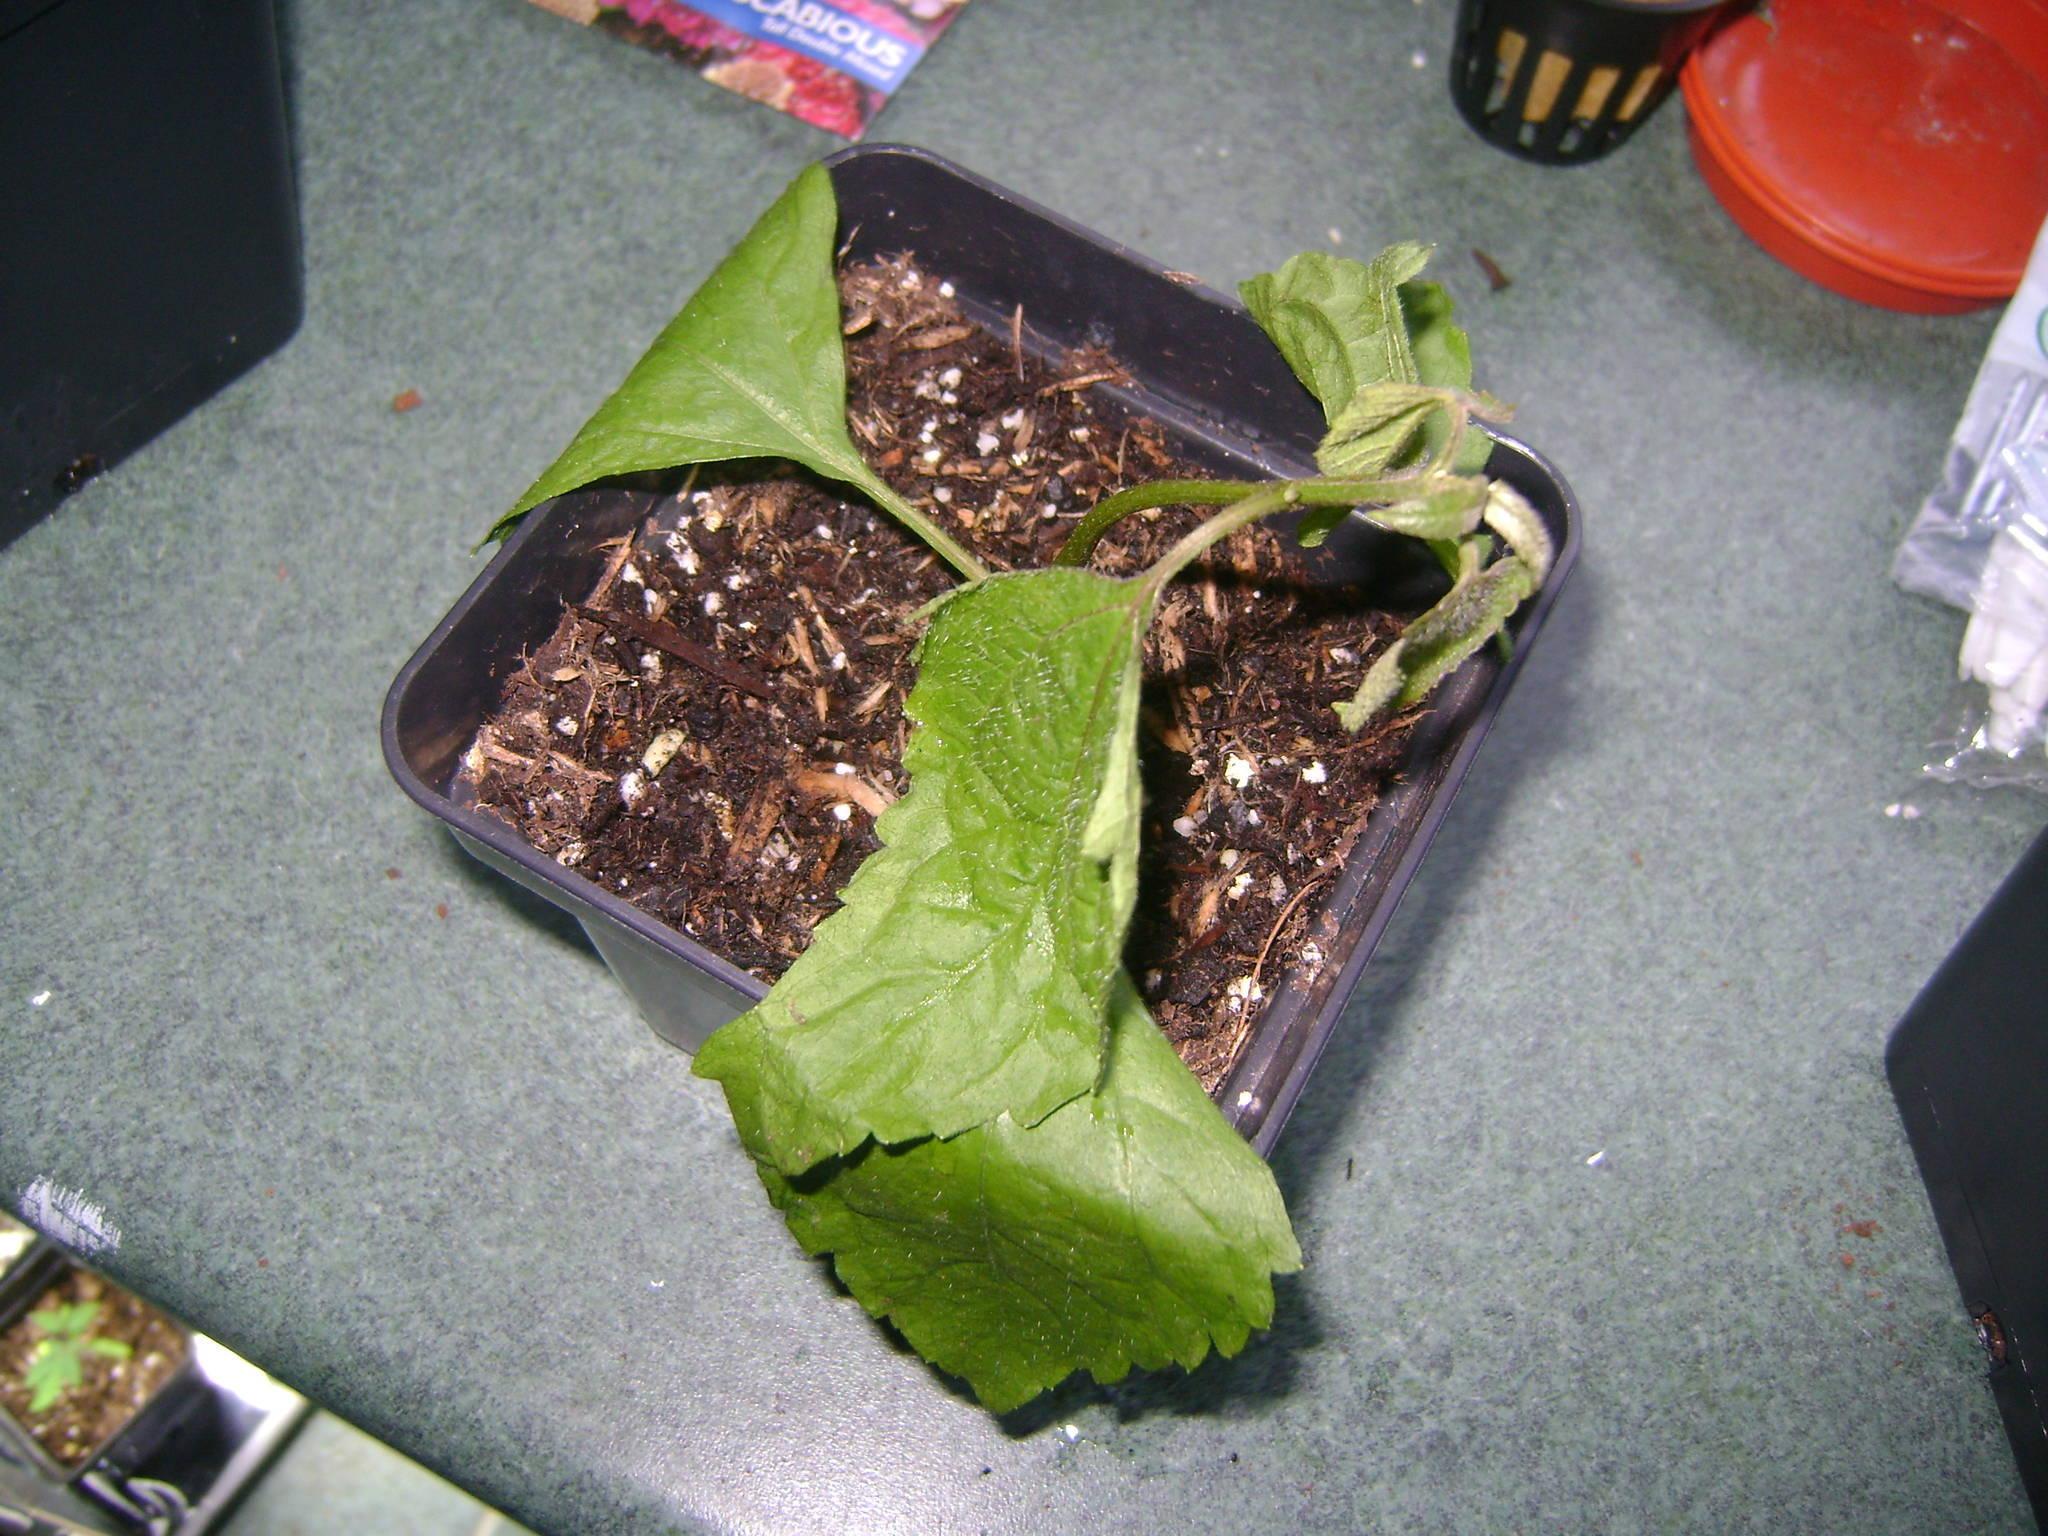 Calea Zacatechichi Whole Foods